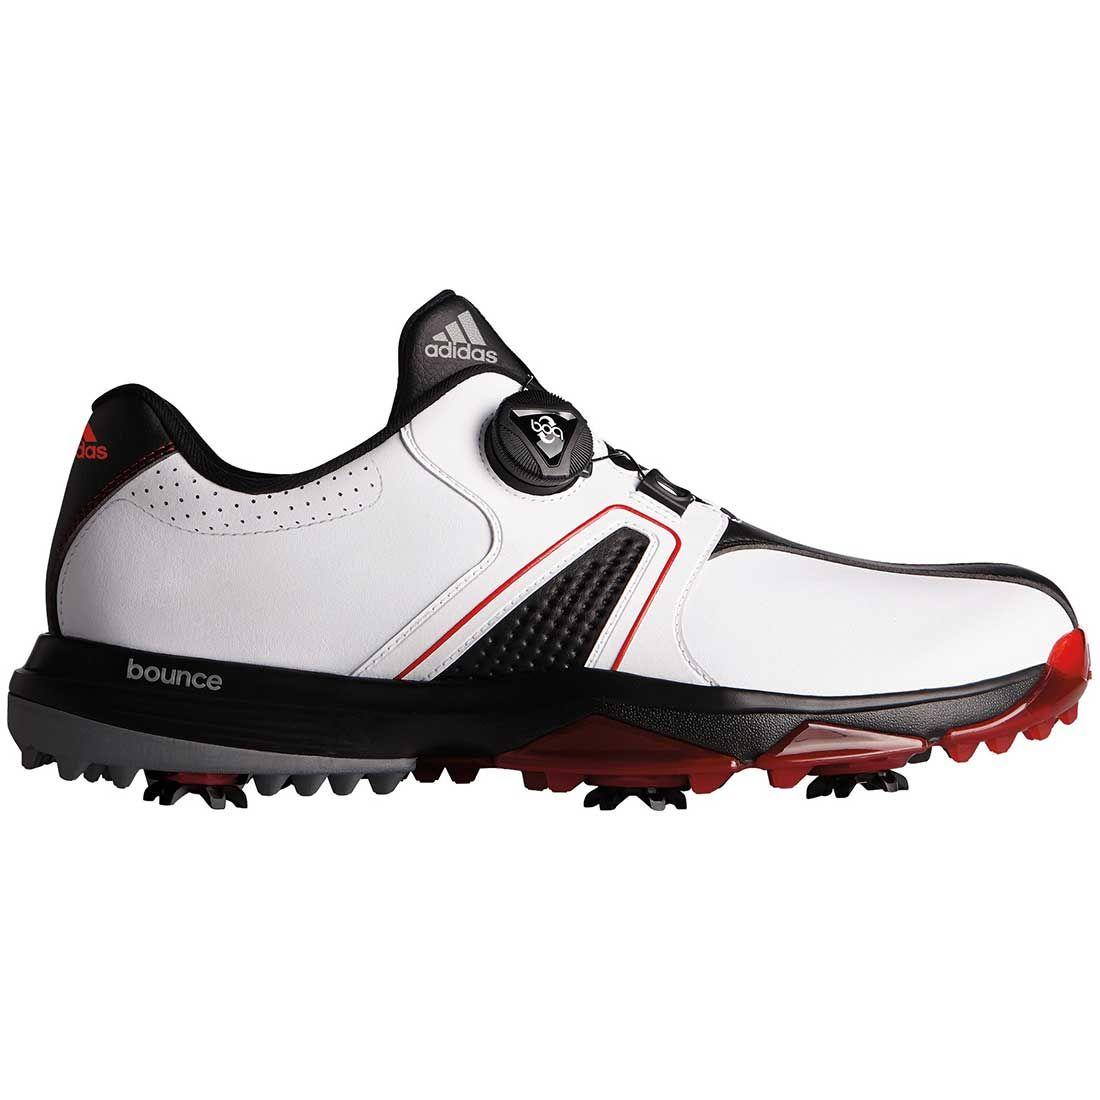 cartel Boda Más allá  Buy Adidas 360 Traxion Boa Golf Shoes White/Black/Red | Golf Discount